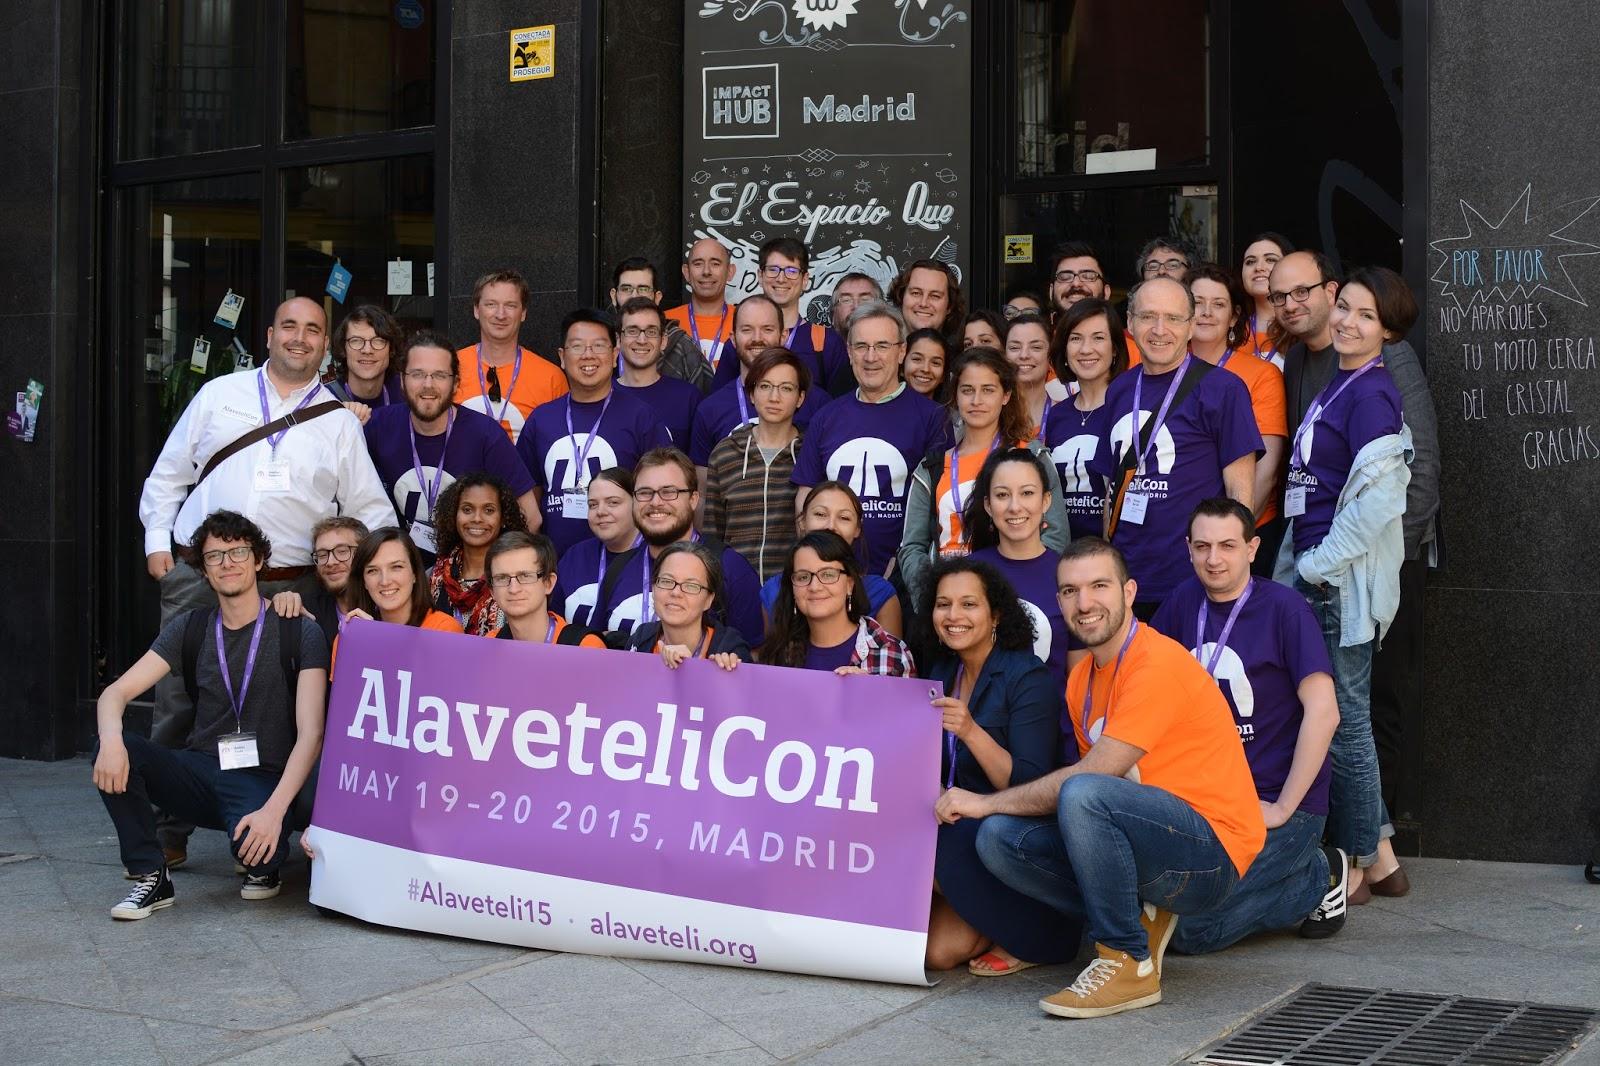 Alavateli_Con_group